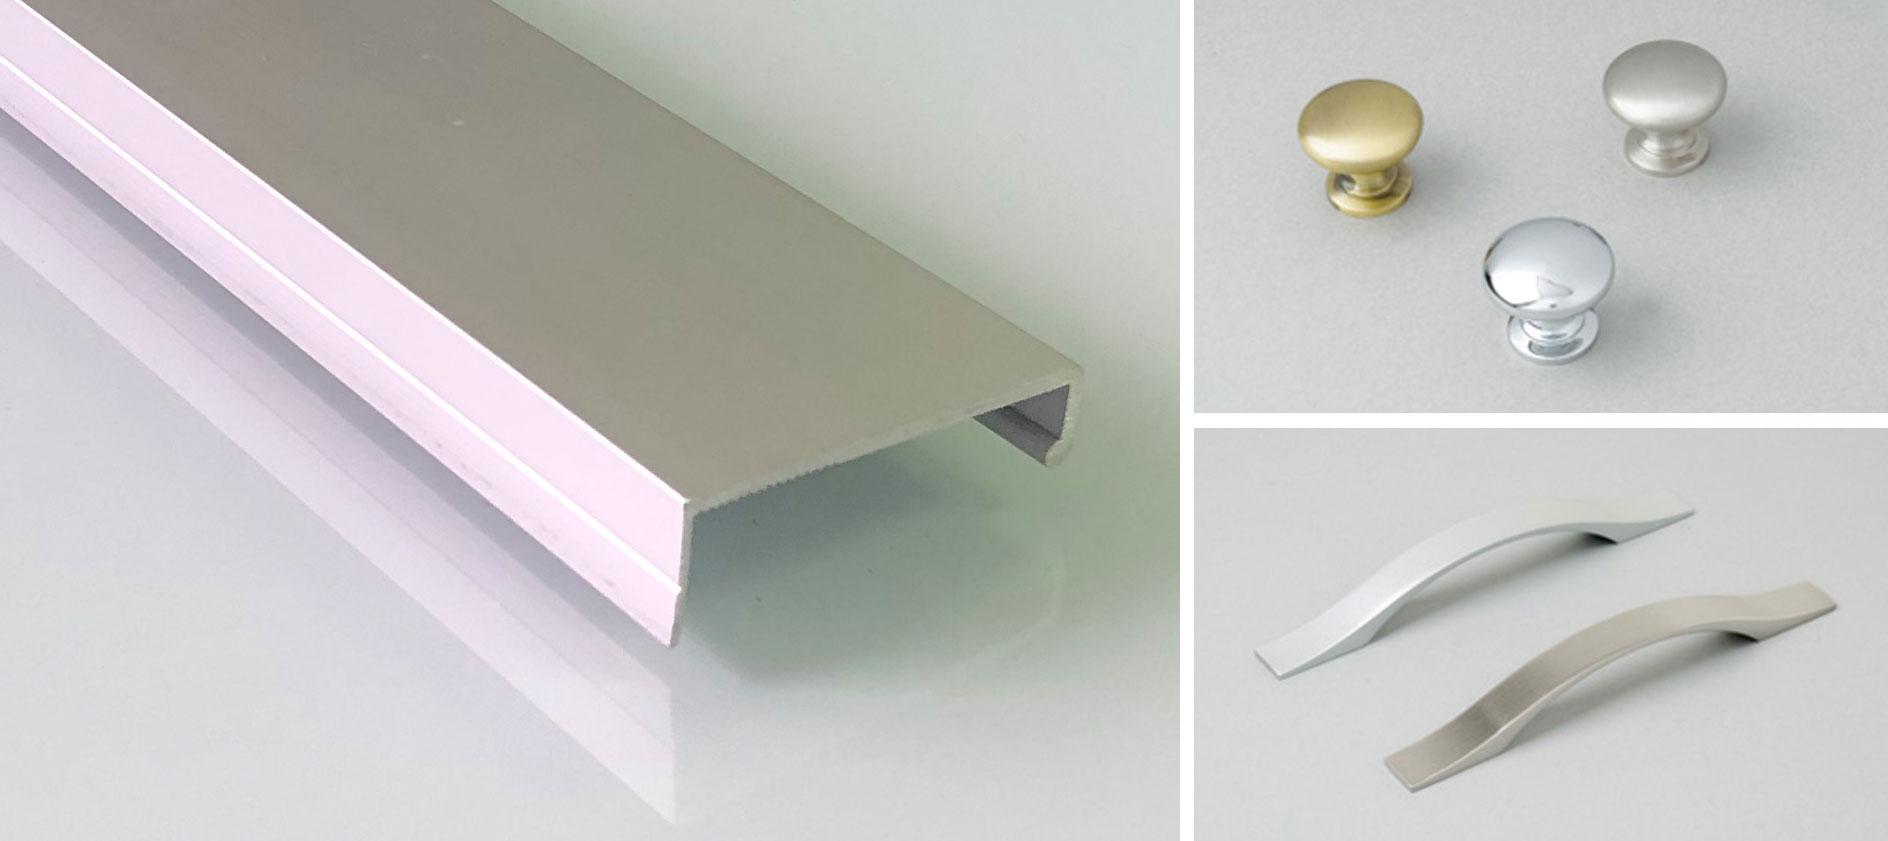 Furniture Accessories Malaysia | Aluminium Profile Accessories | Kasity Malaysia